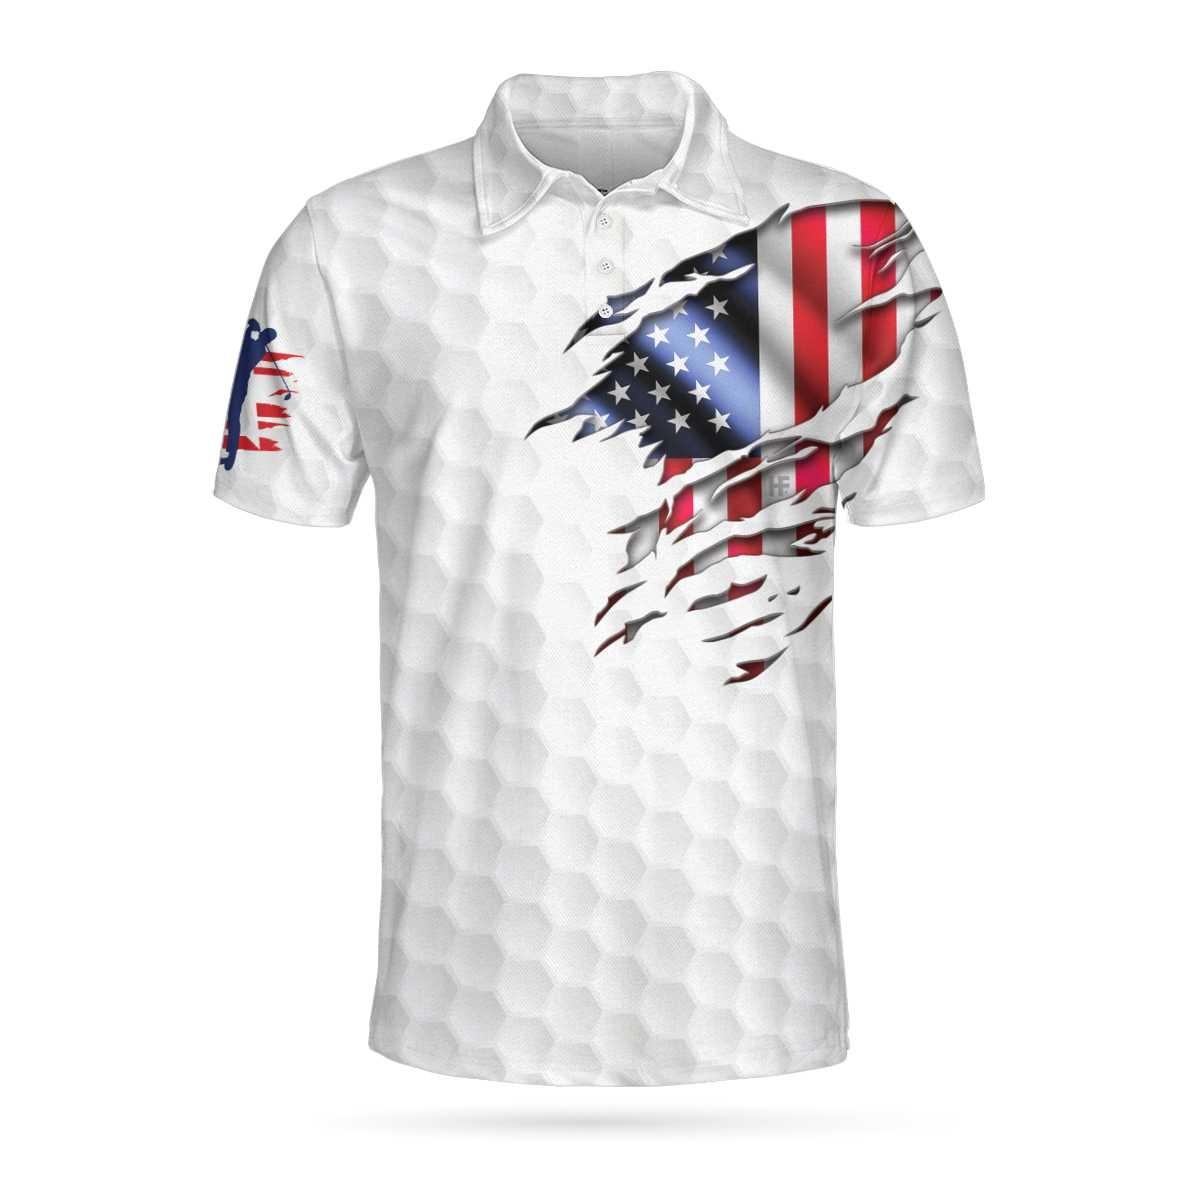 Golf American flag polo shirt4 1